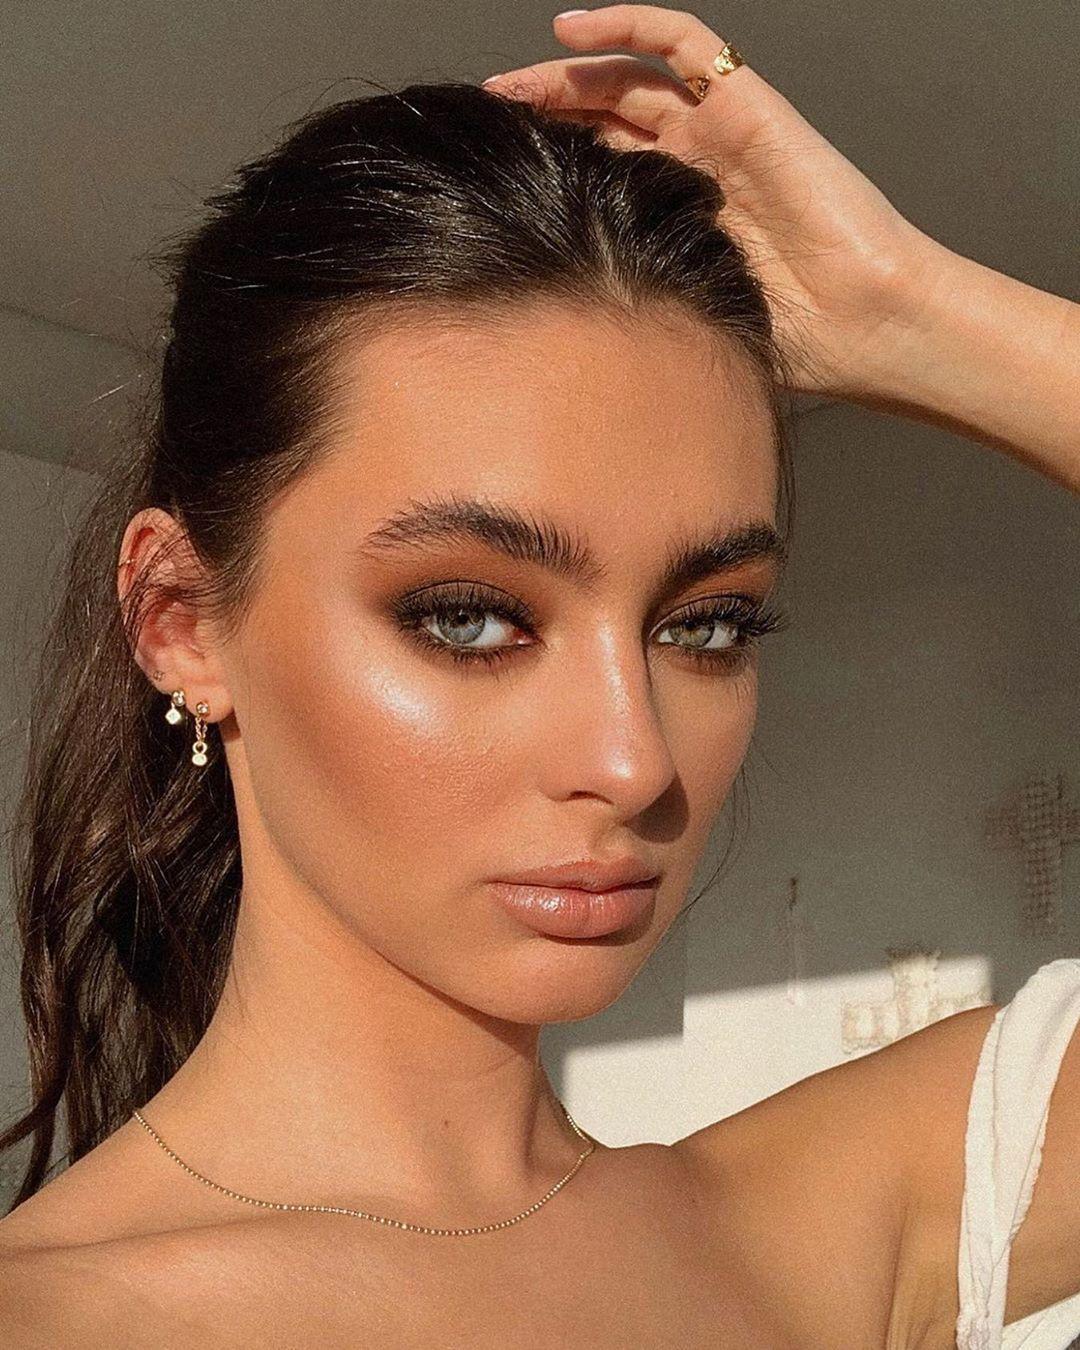 Glamazon Kuwait On Instagram Makeup By Makeupbylilik Model Georgiabutcherrr Makeup Beauty Glamazonkw In 2020 Beauty Makeup Model